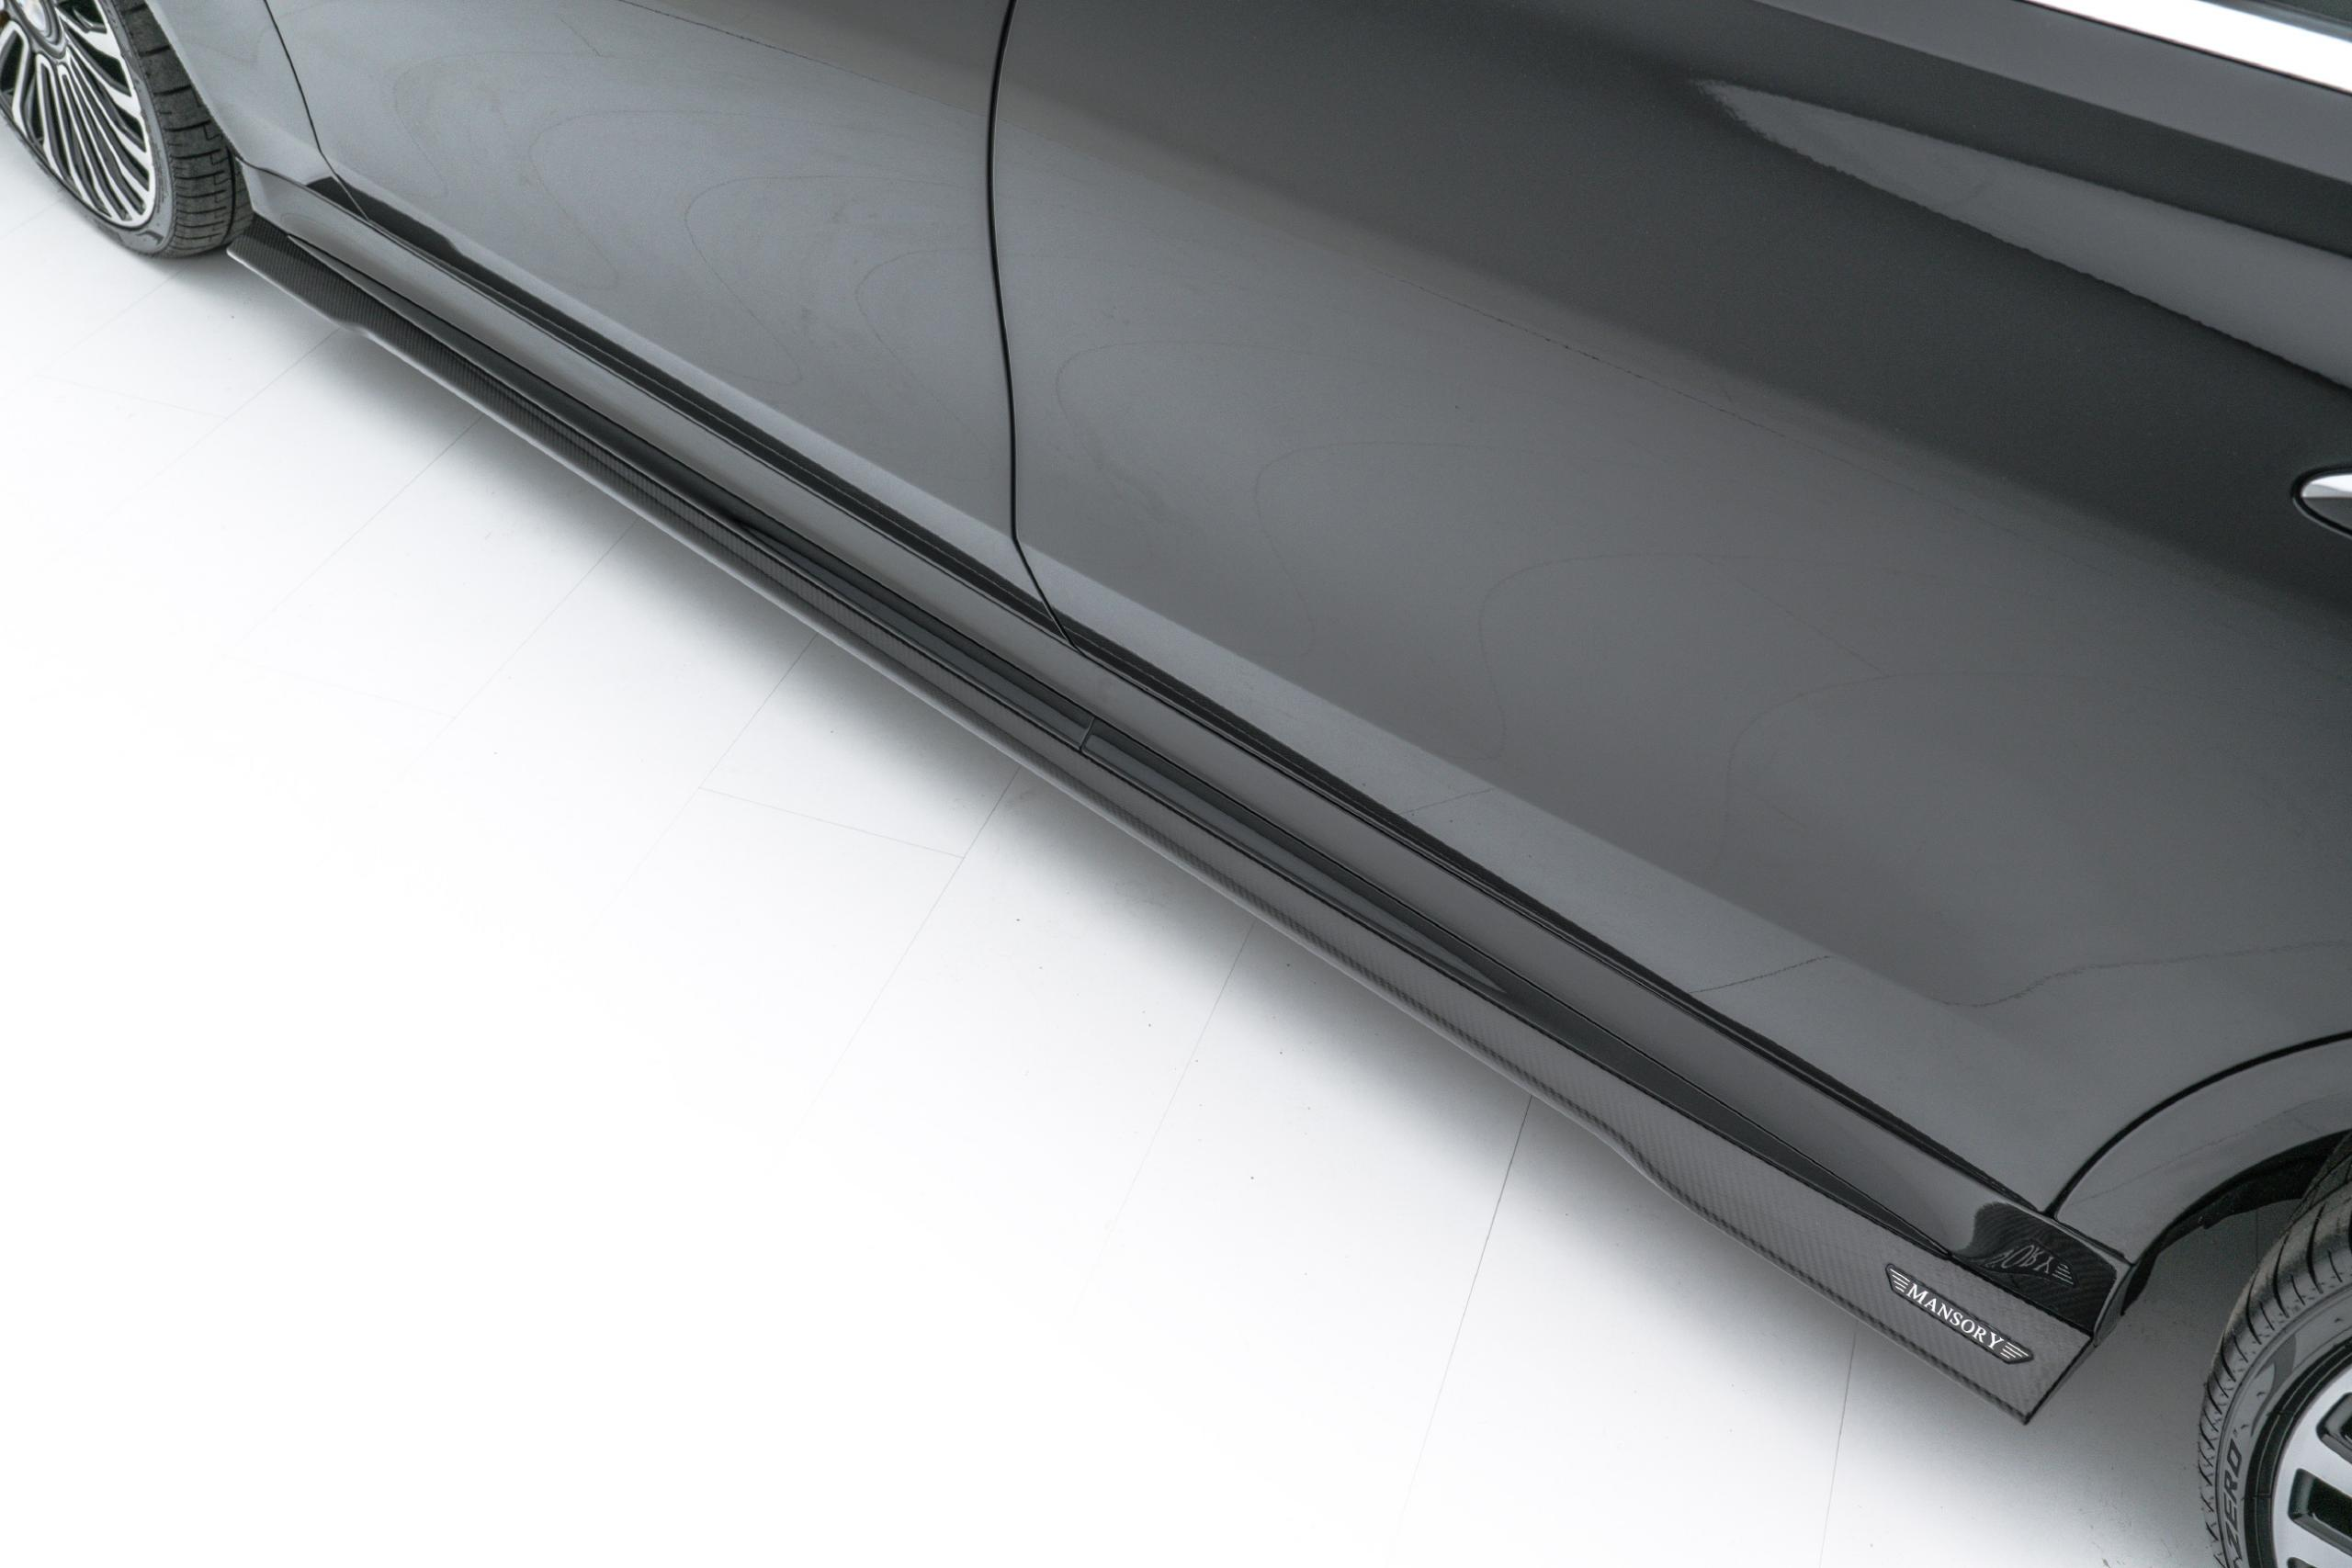 mansory w223 mercedes s class body kit carbon fiber side skirt set 2021 2022 2023